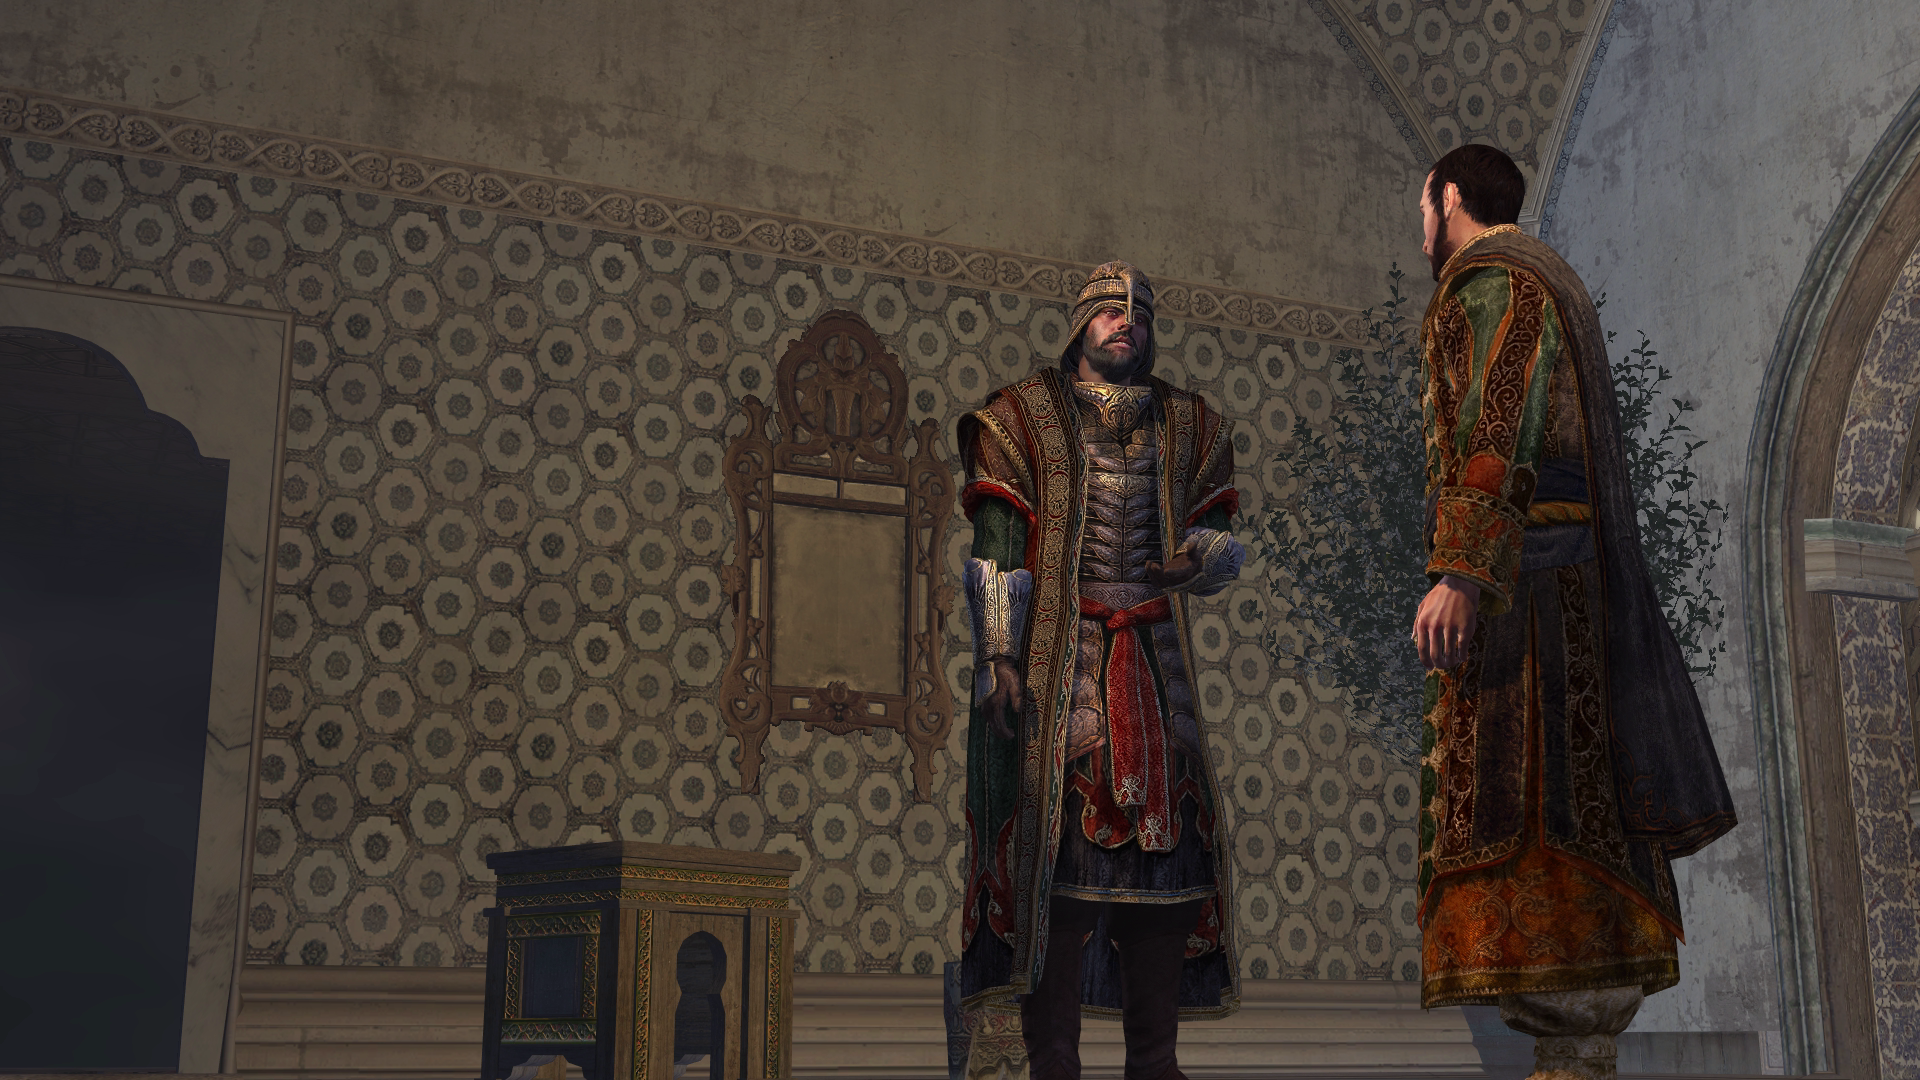 Tarik barleti the assassin 39 s creed wiki assassin 39 s creed assassin 39 s creed ii assassin 39 s - Ottoman empire assassins creed ...